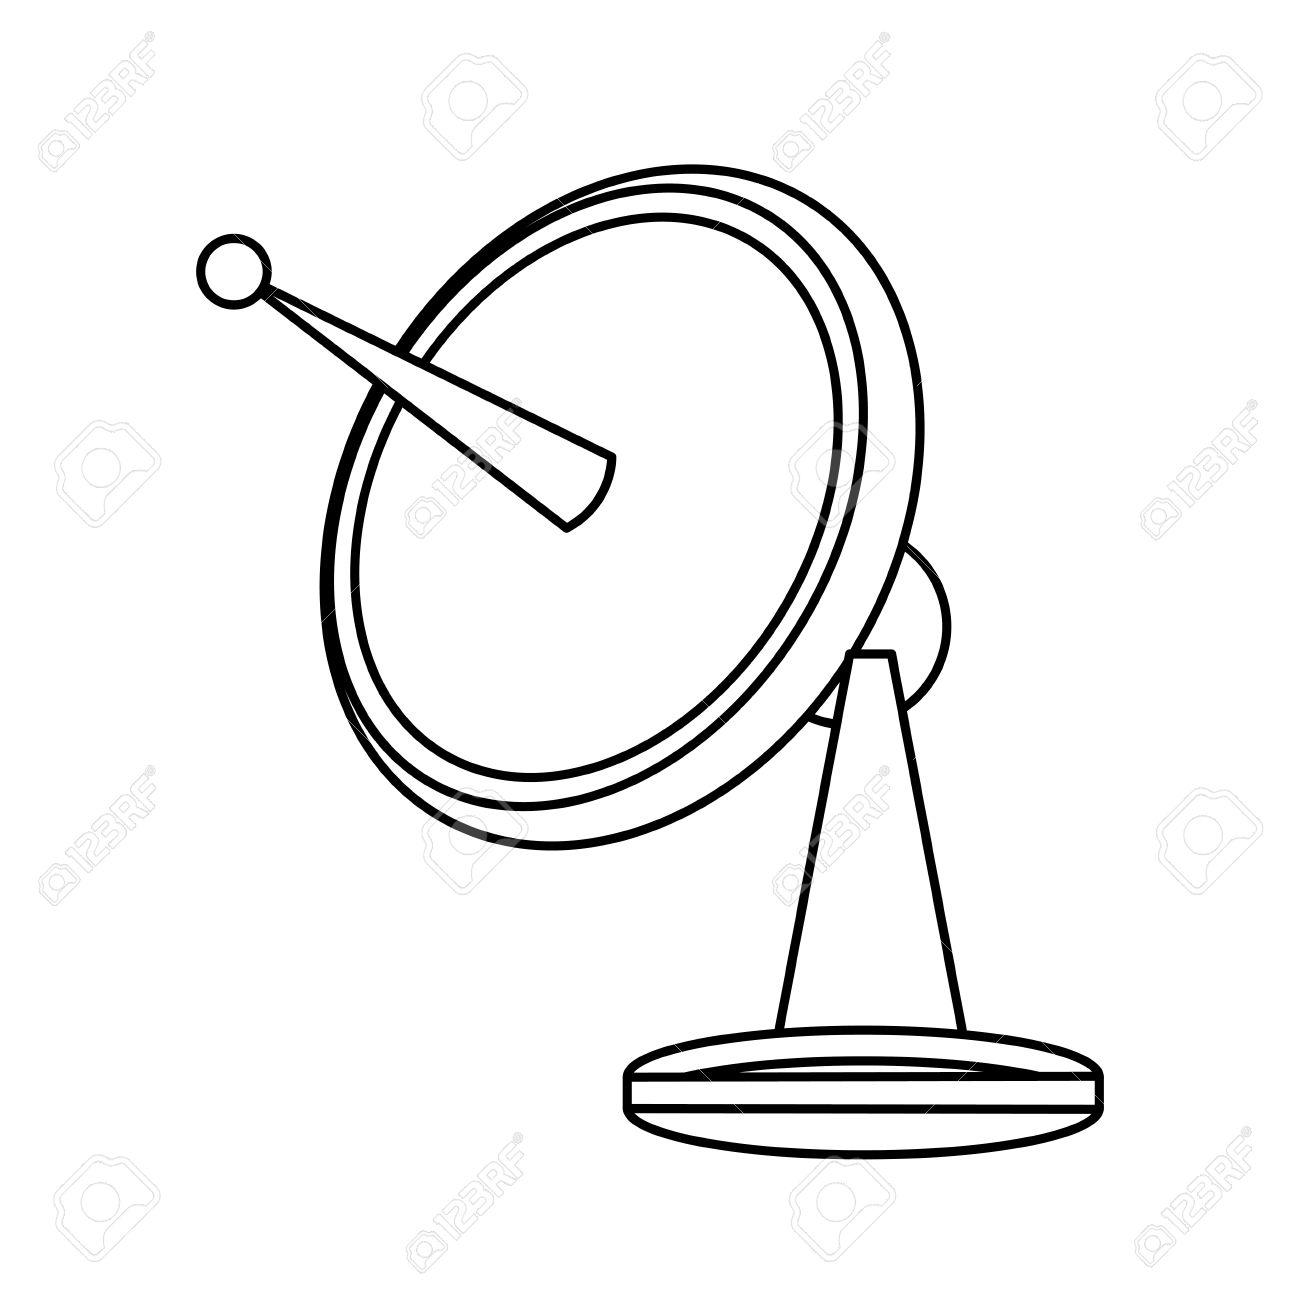 Satellite Dish Communication Technology Network Vector Illustration